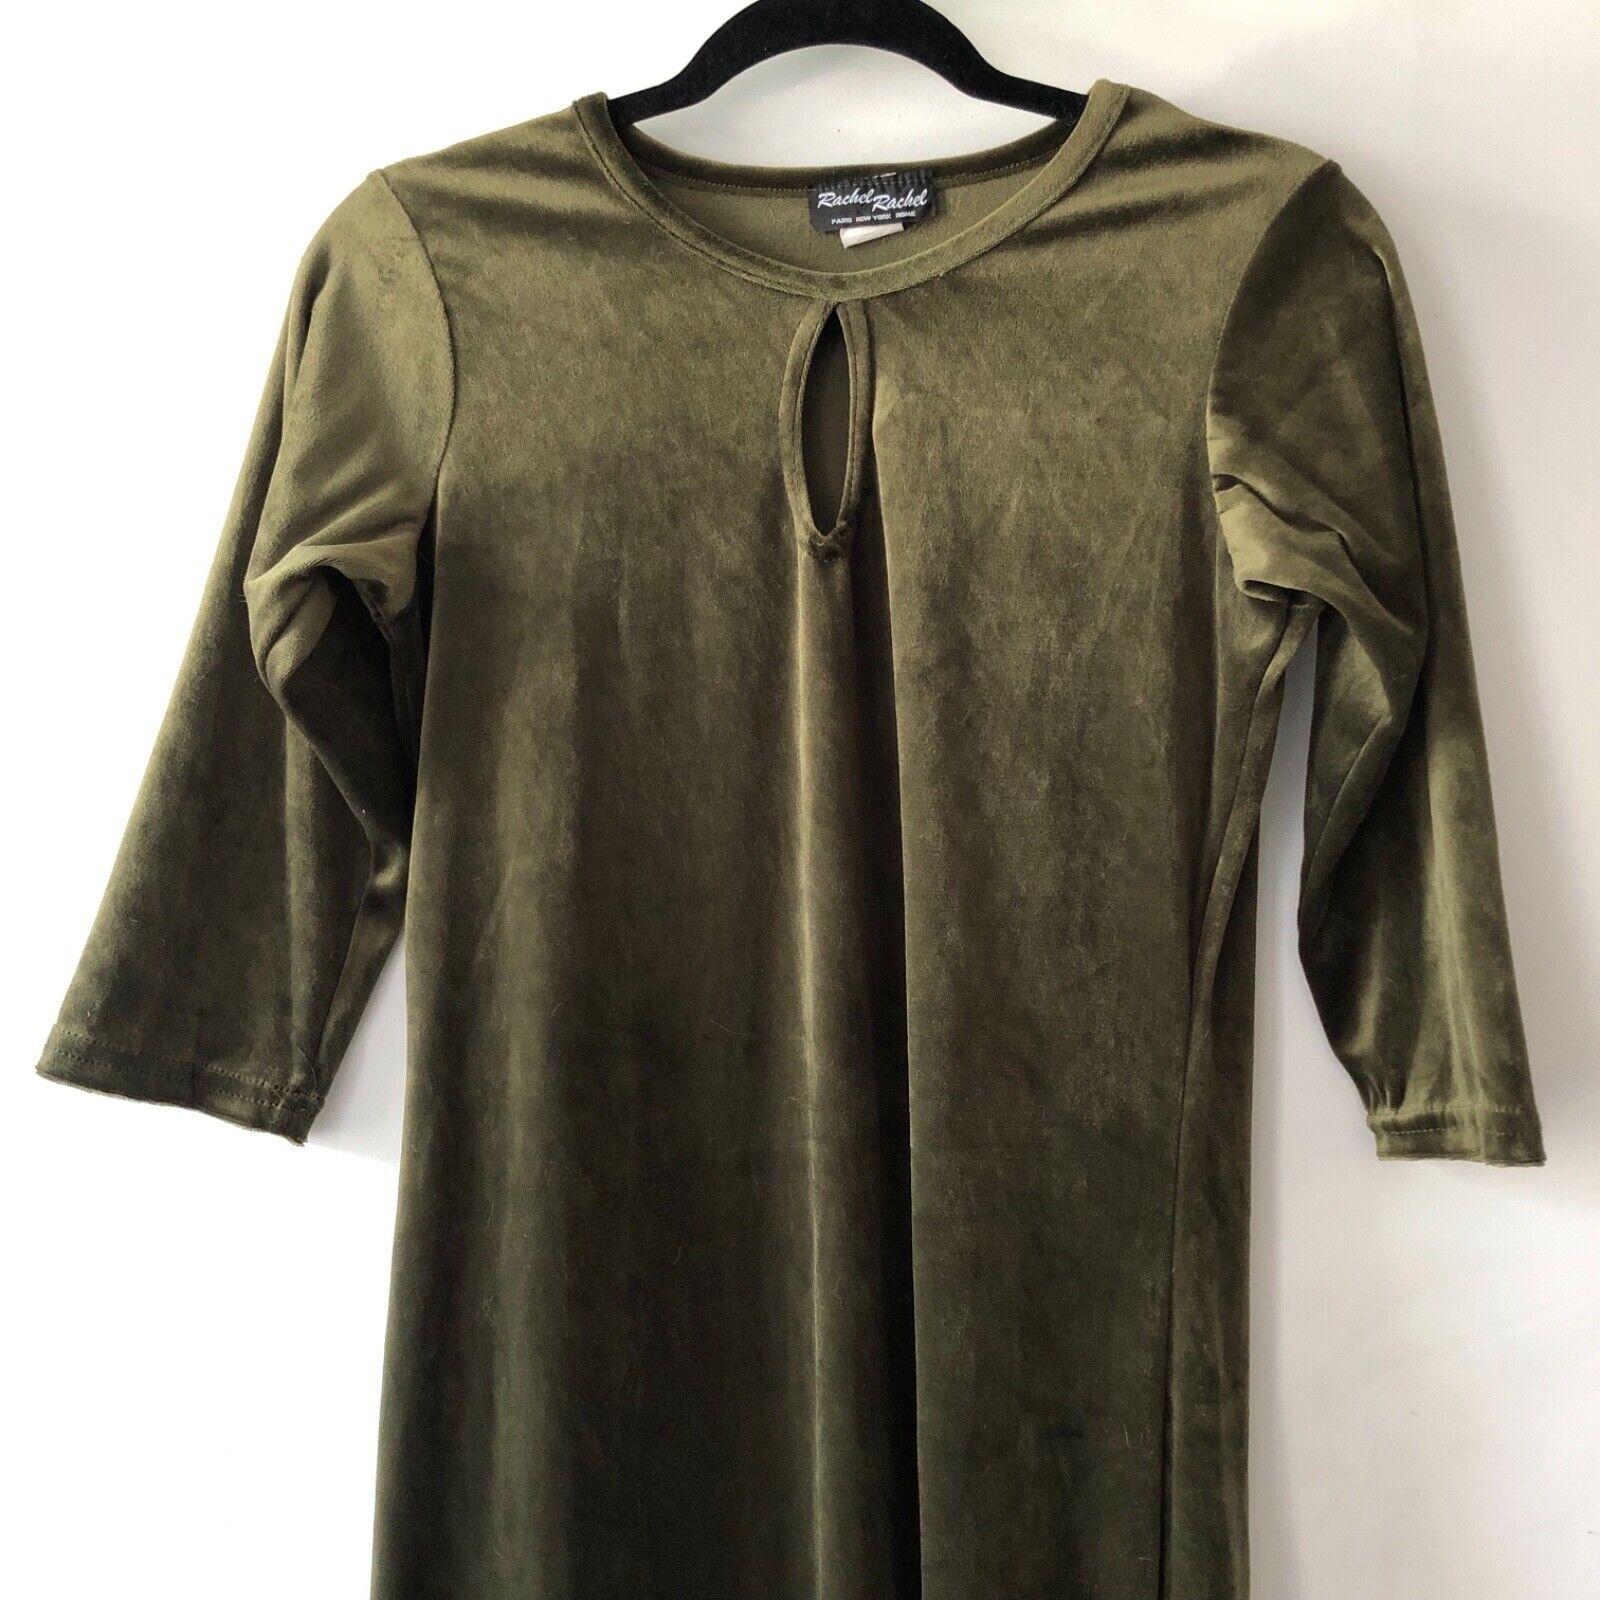 Vintage 90s velvet olive green maxi dress medium - image 2